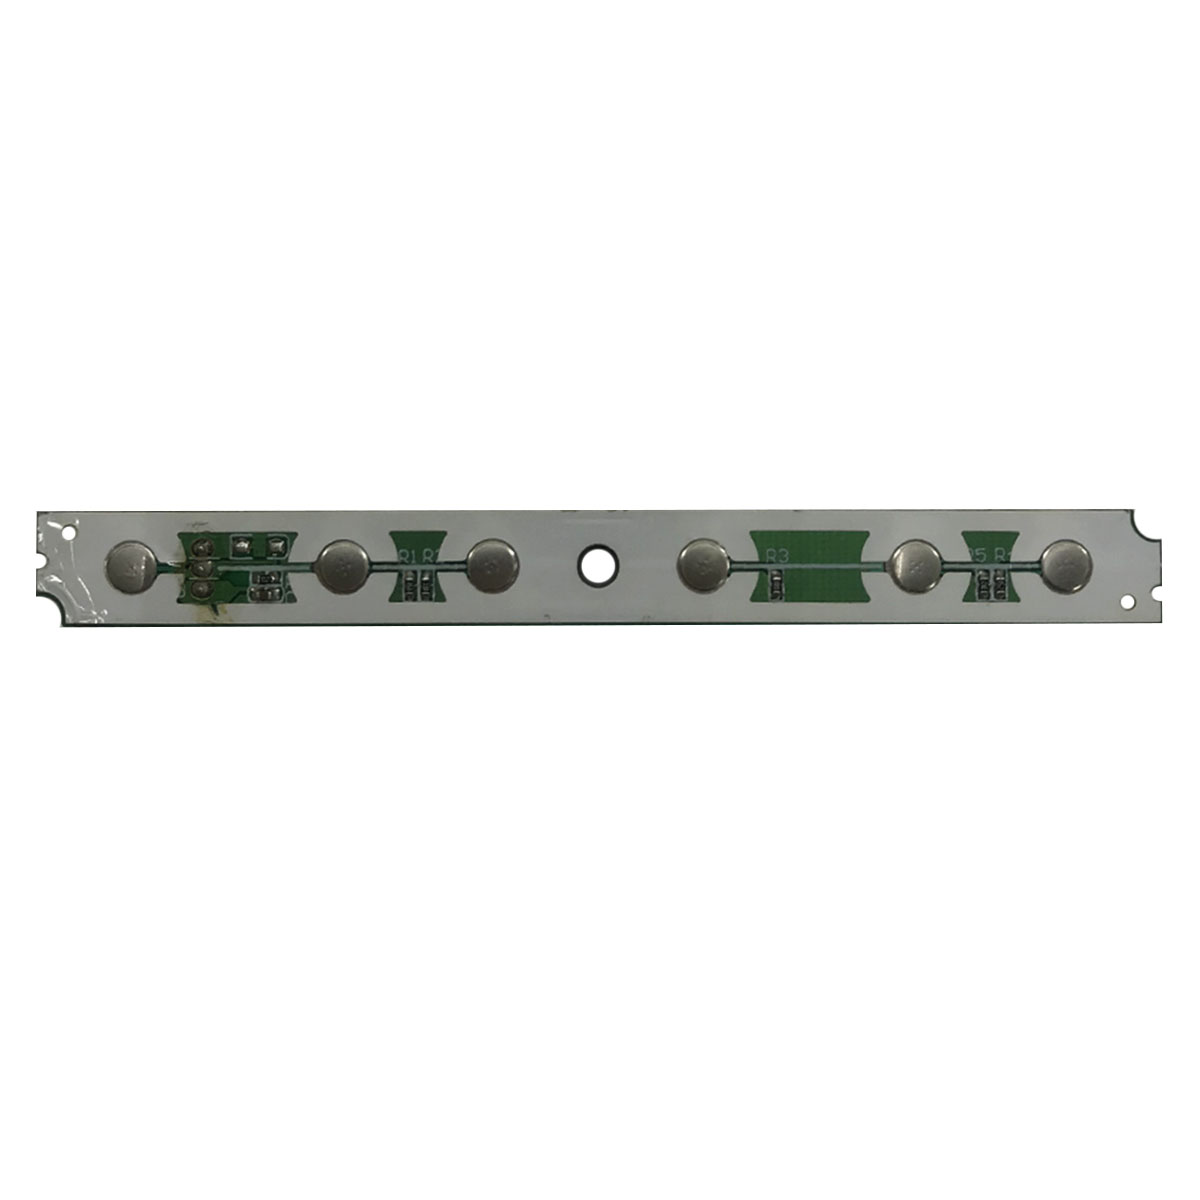 Панель кнопок 2722 171 90545 для Philips 40PFL5007T